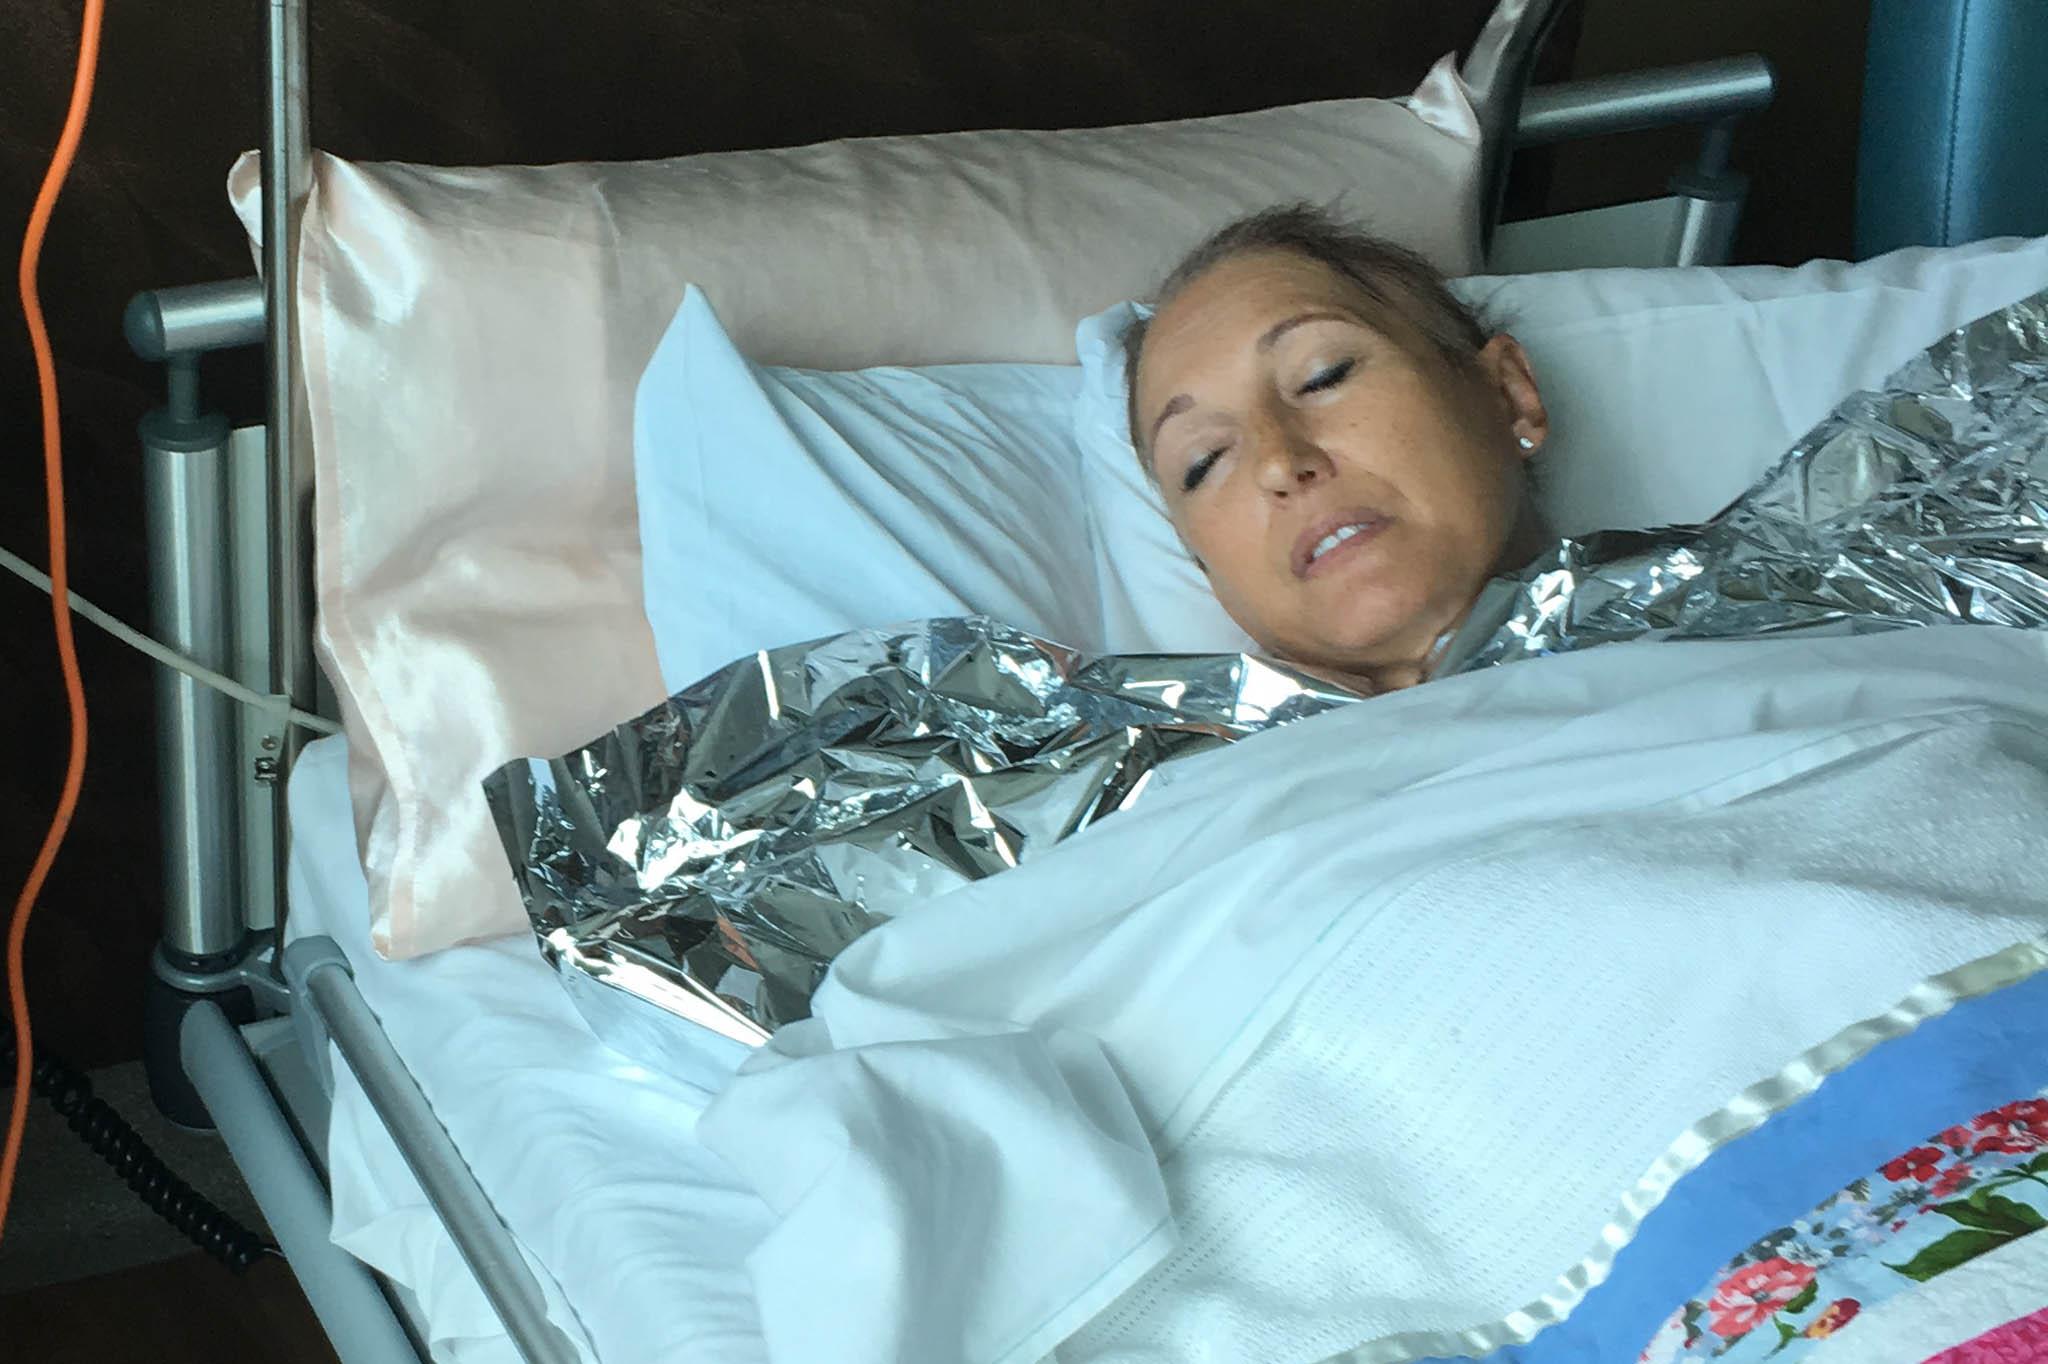 suzi juracic after allograft transplant photo grid